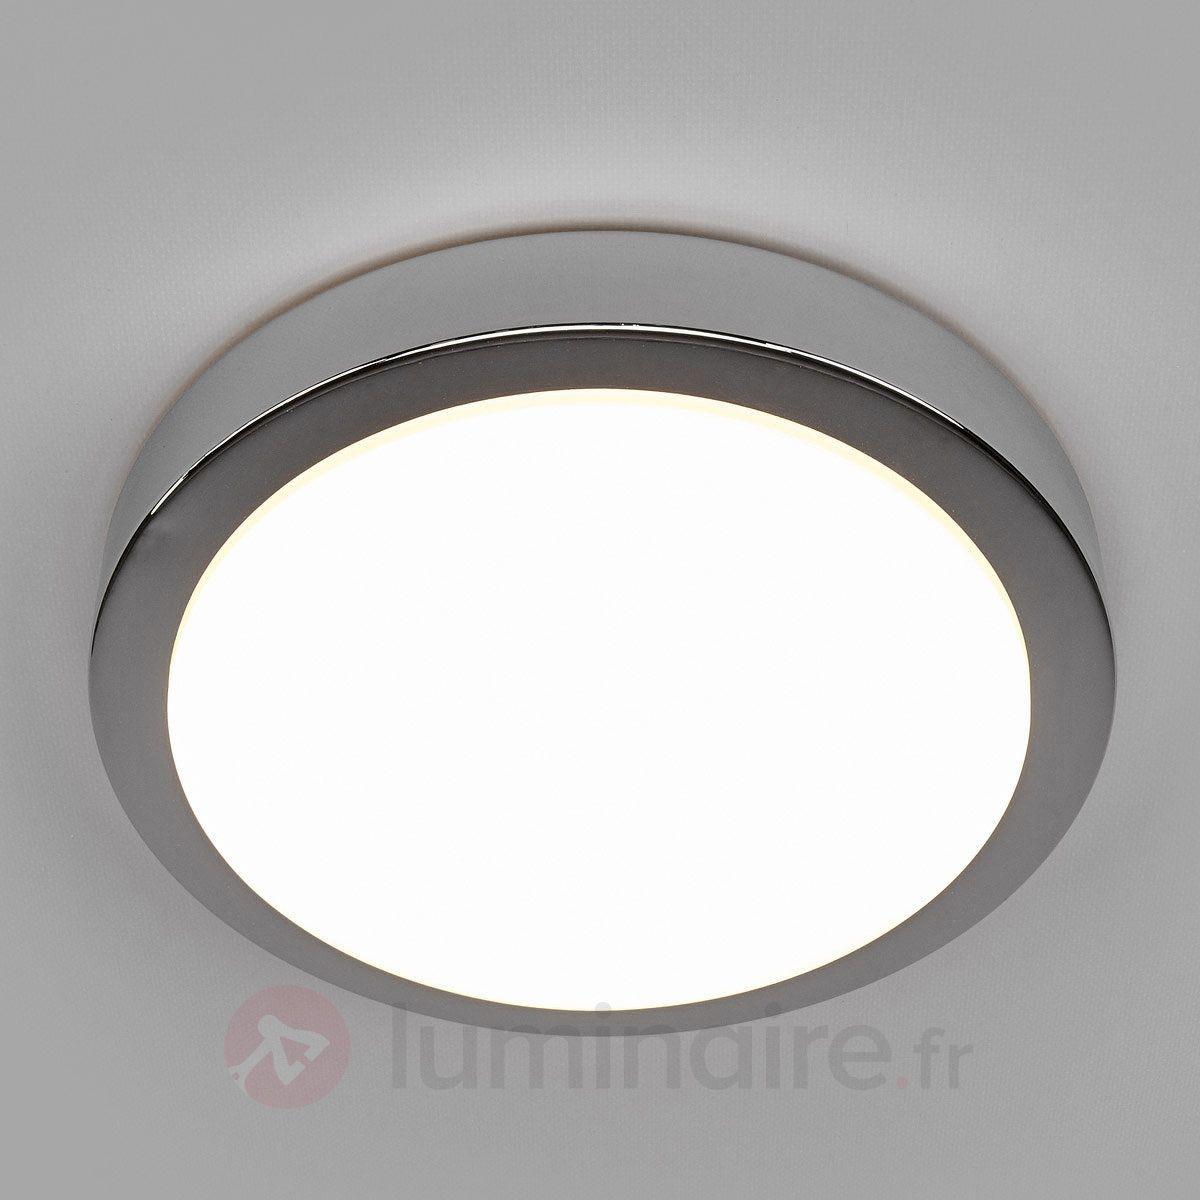 Plafonnier salle de bain LED Aras chromé brillant | LED